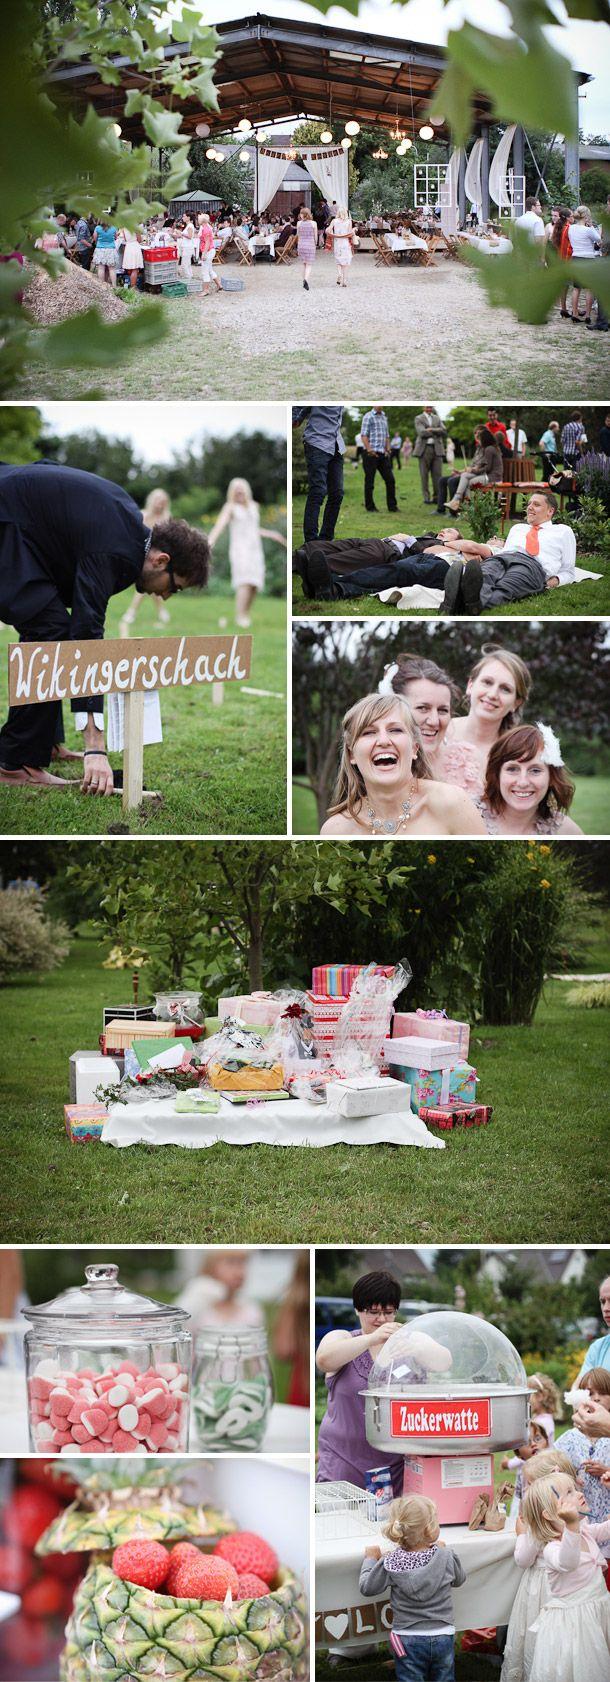 Regina und Andreas DIY-Vintage Hochzeit. yay for wedding swedish cubb game!